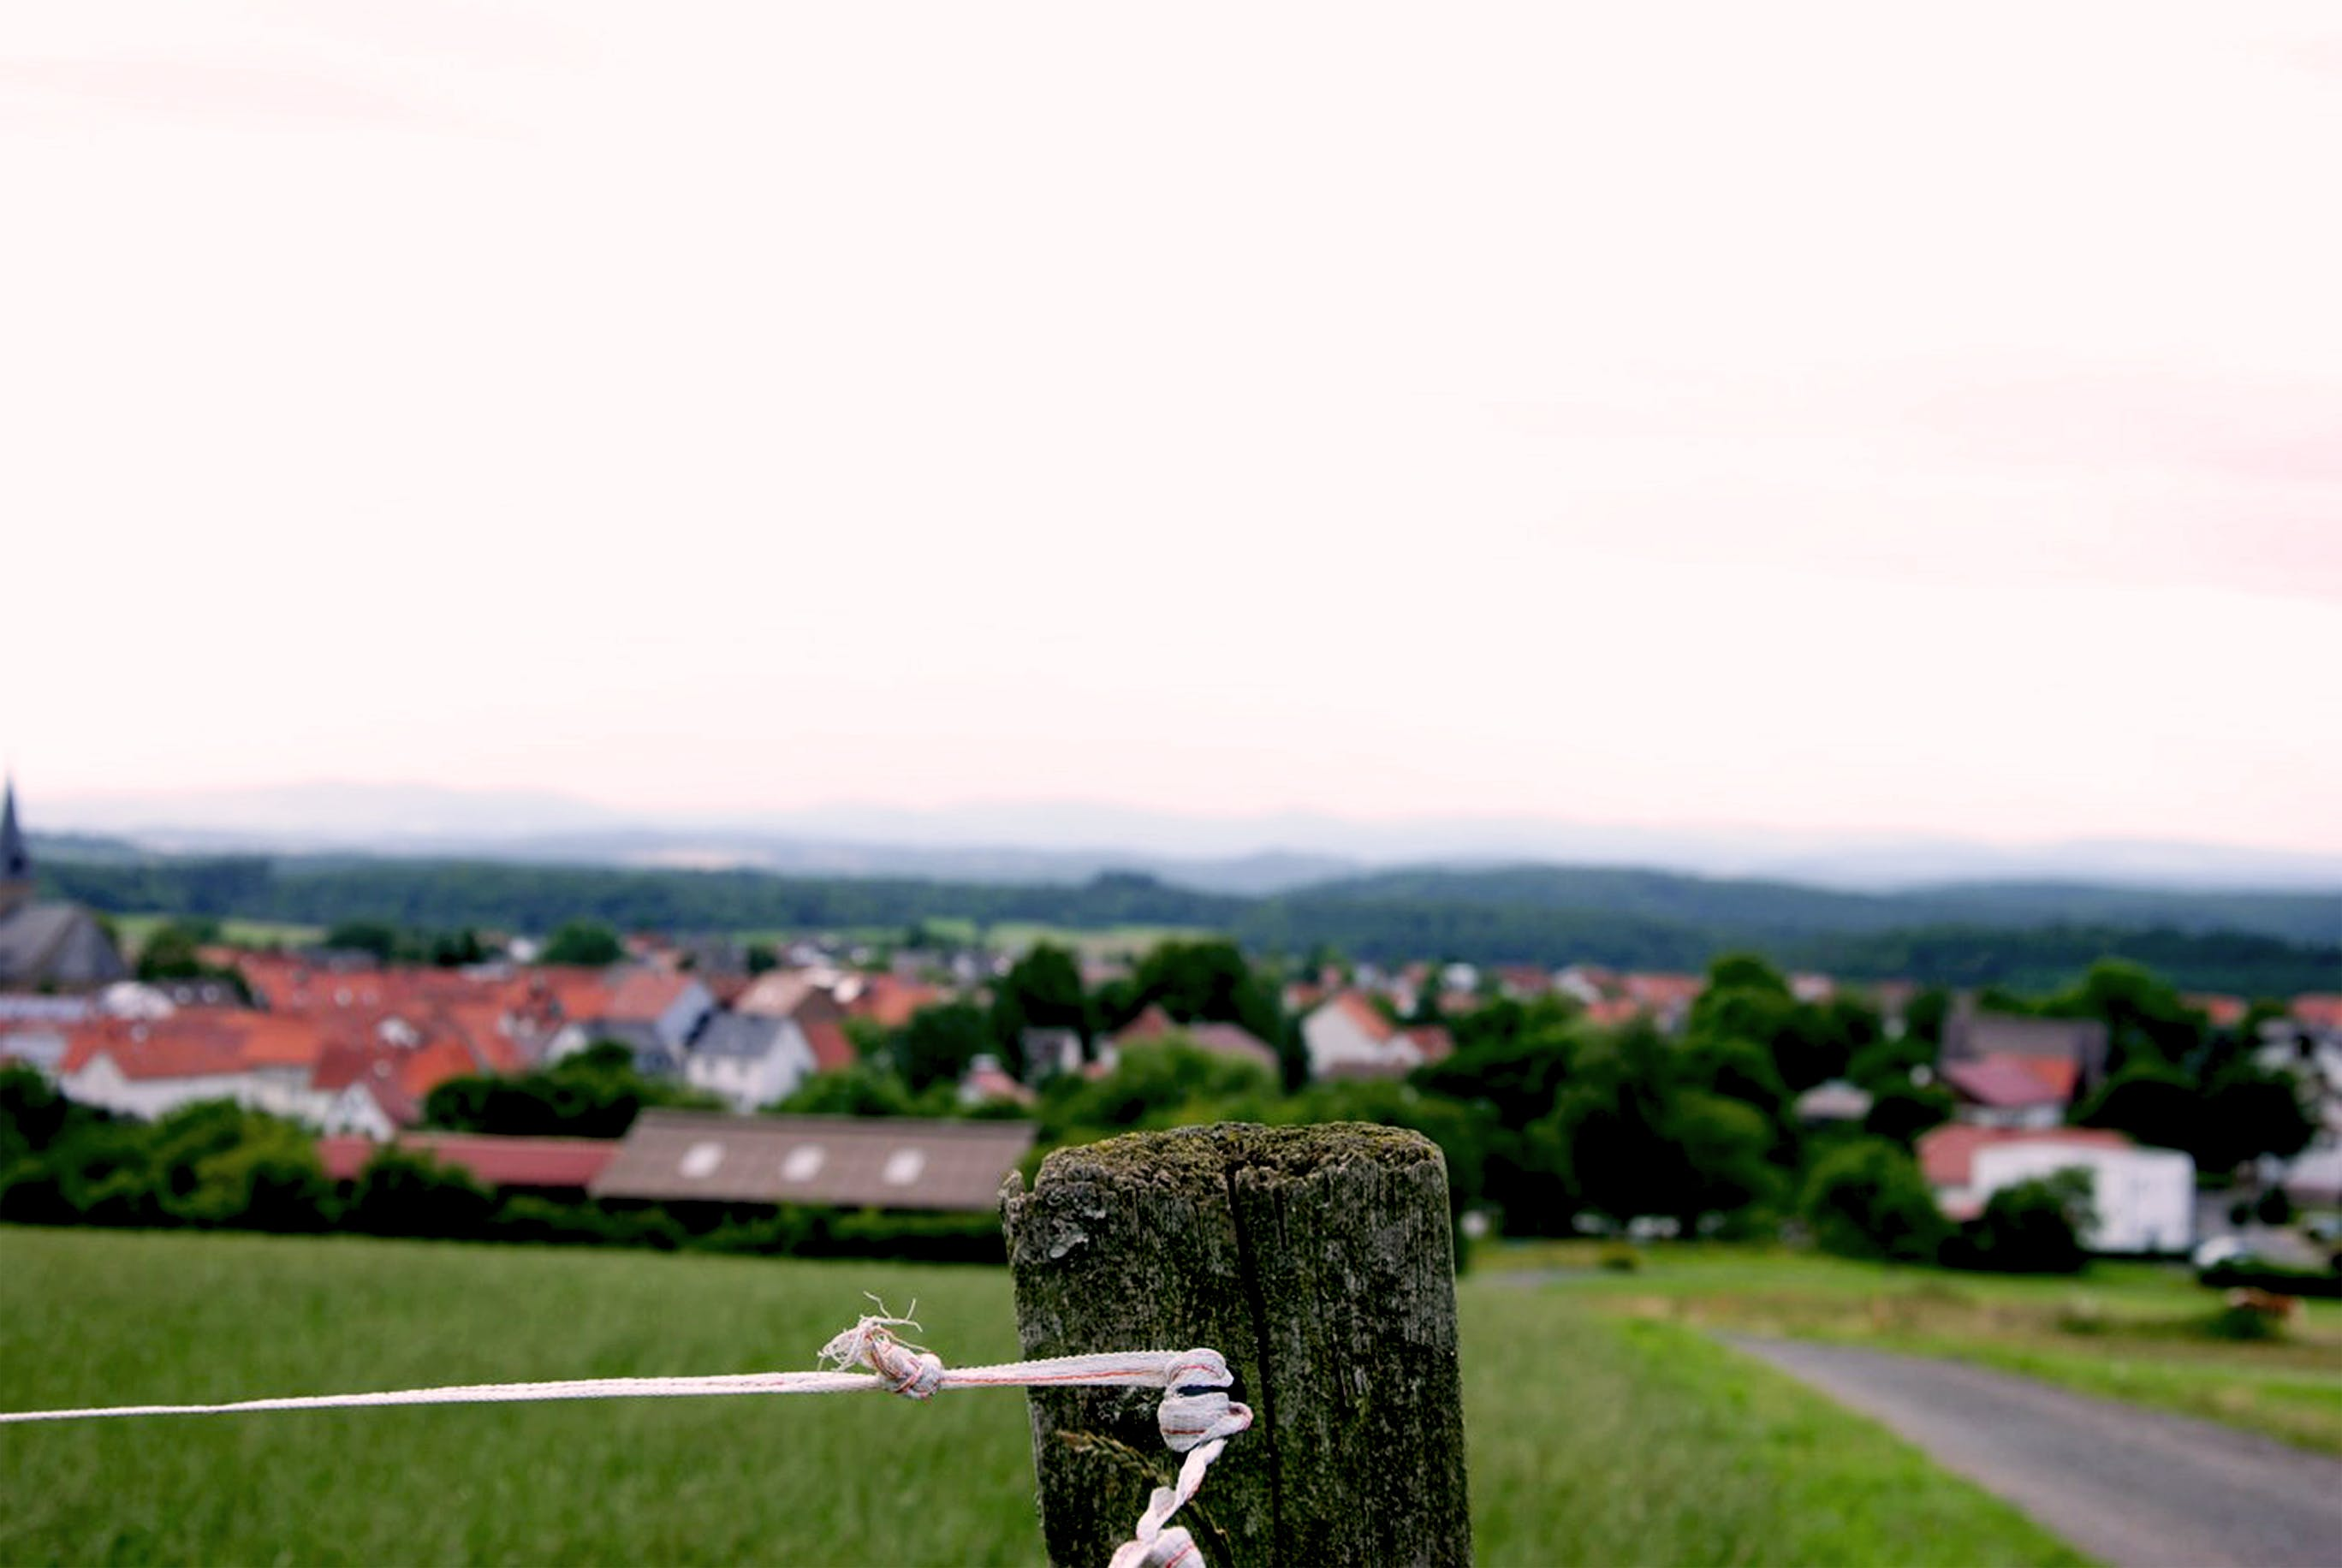 Free stock photo of fence, fencing, Frankenau, germany